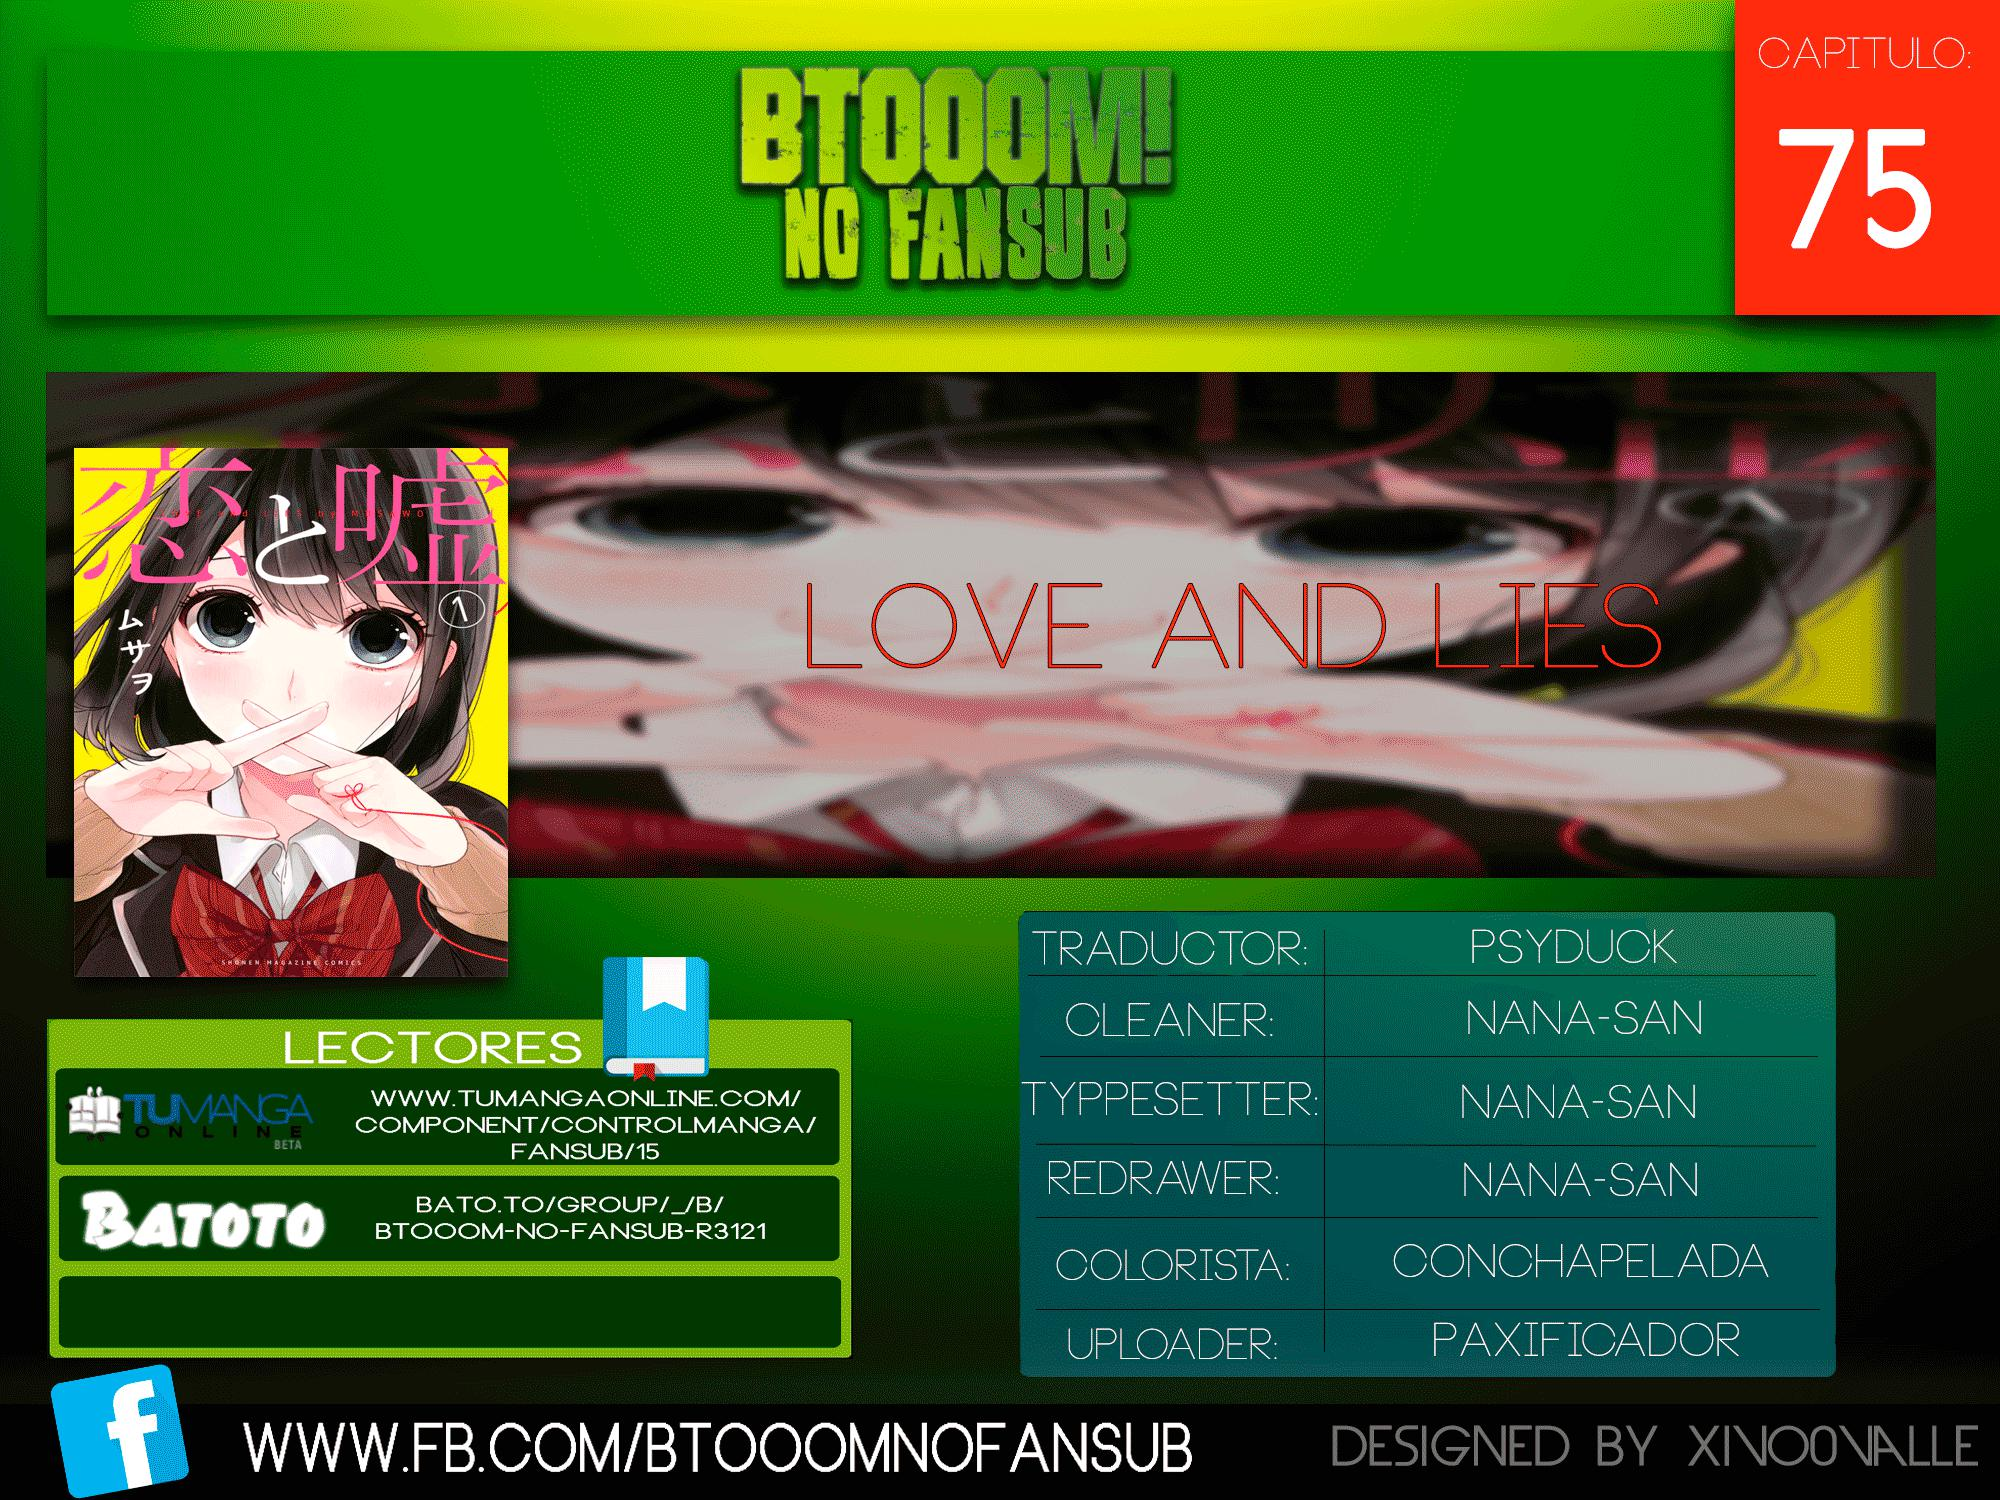 http://c5.ninemanga.com/es_manga/14/14734/441693/e69ccd834405b002add6e2ff6664496d.jpg Page 1